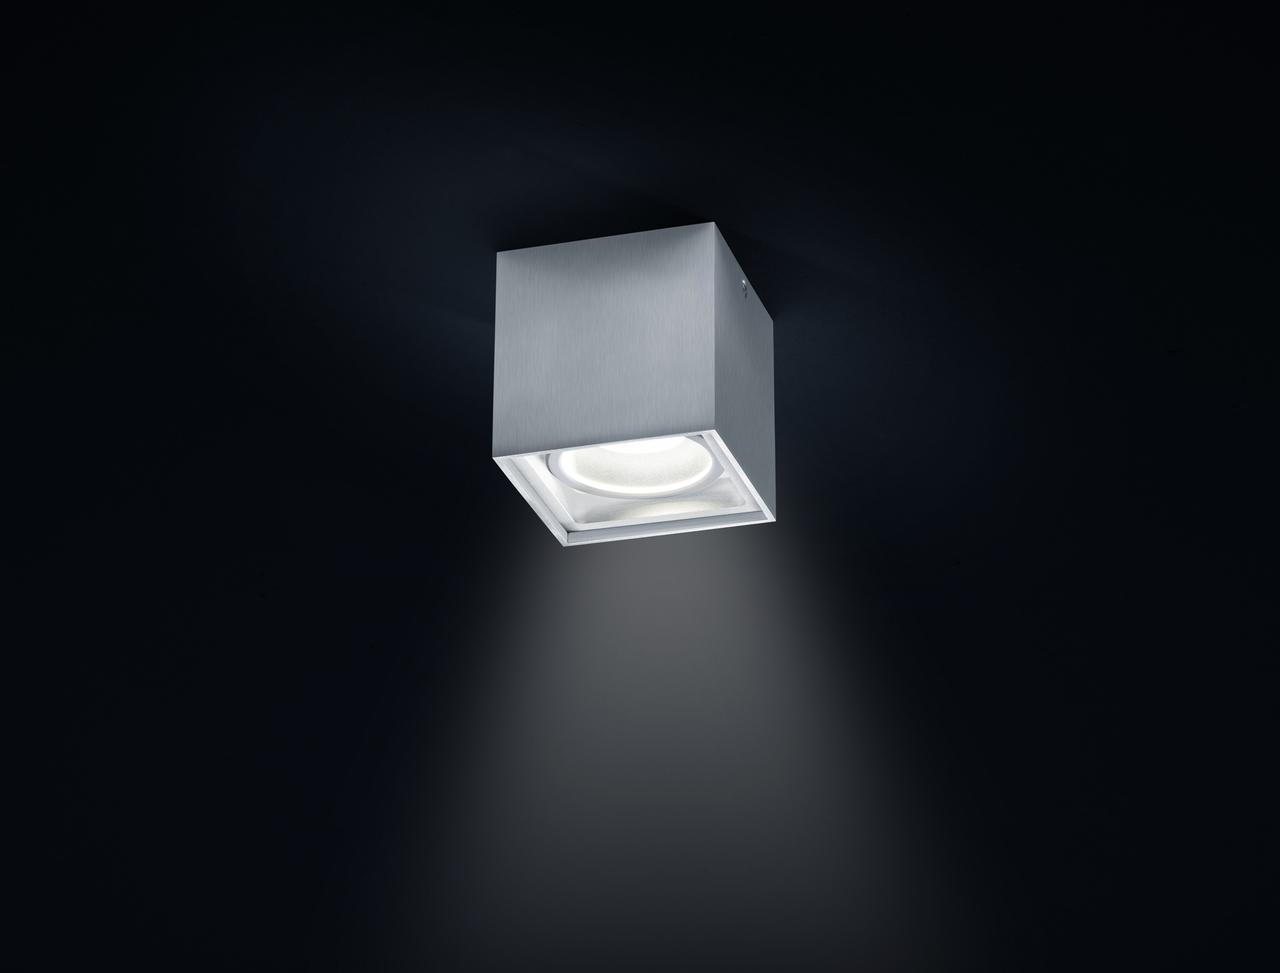 Helestra LED Downlight Siri LED, Metallisch, Aluminium, 15/1559.26